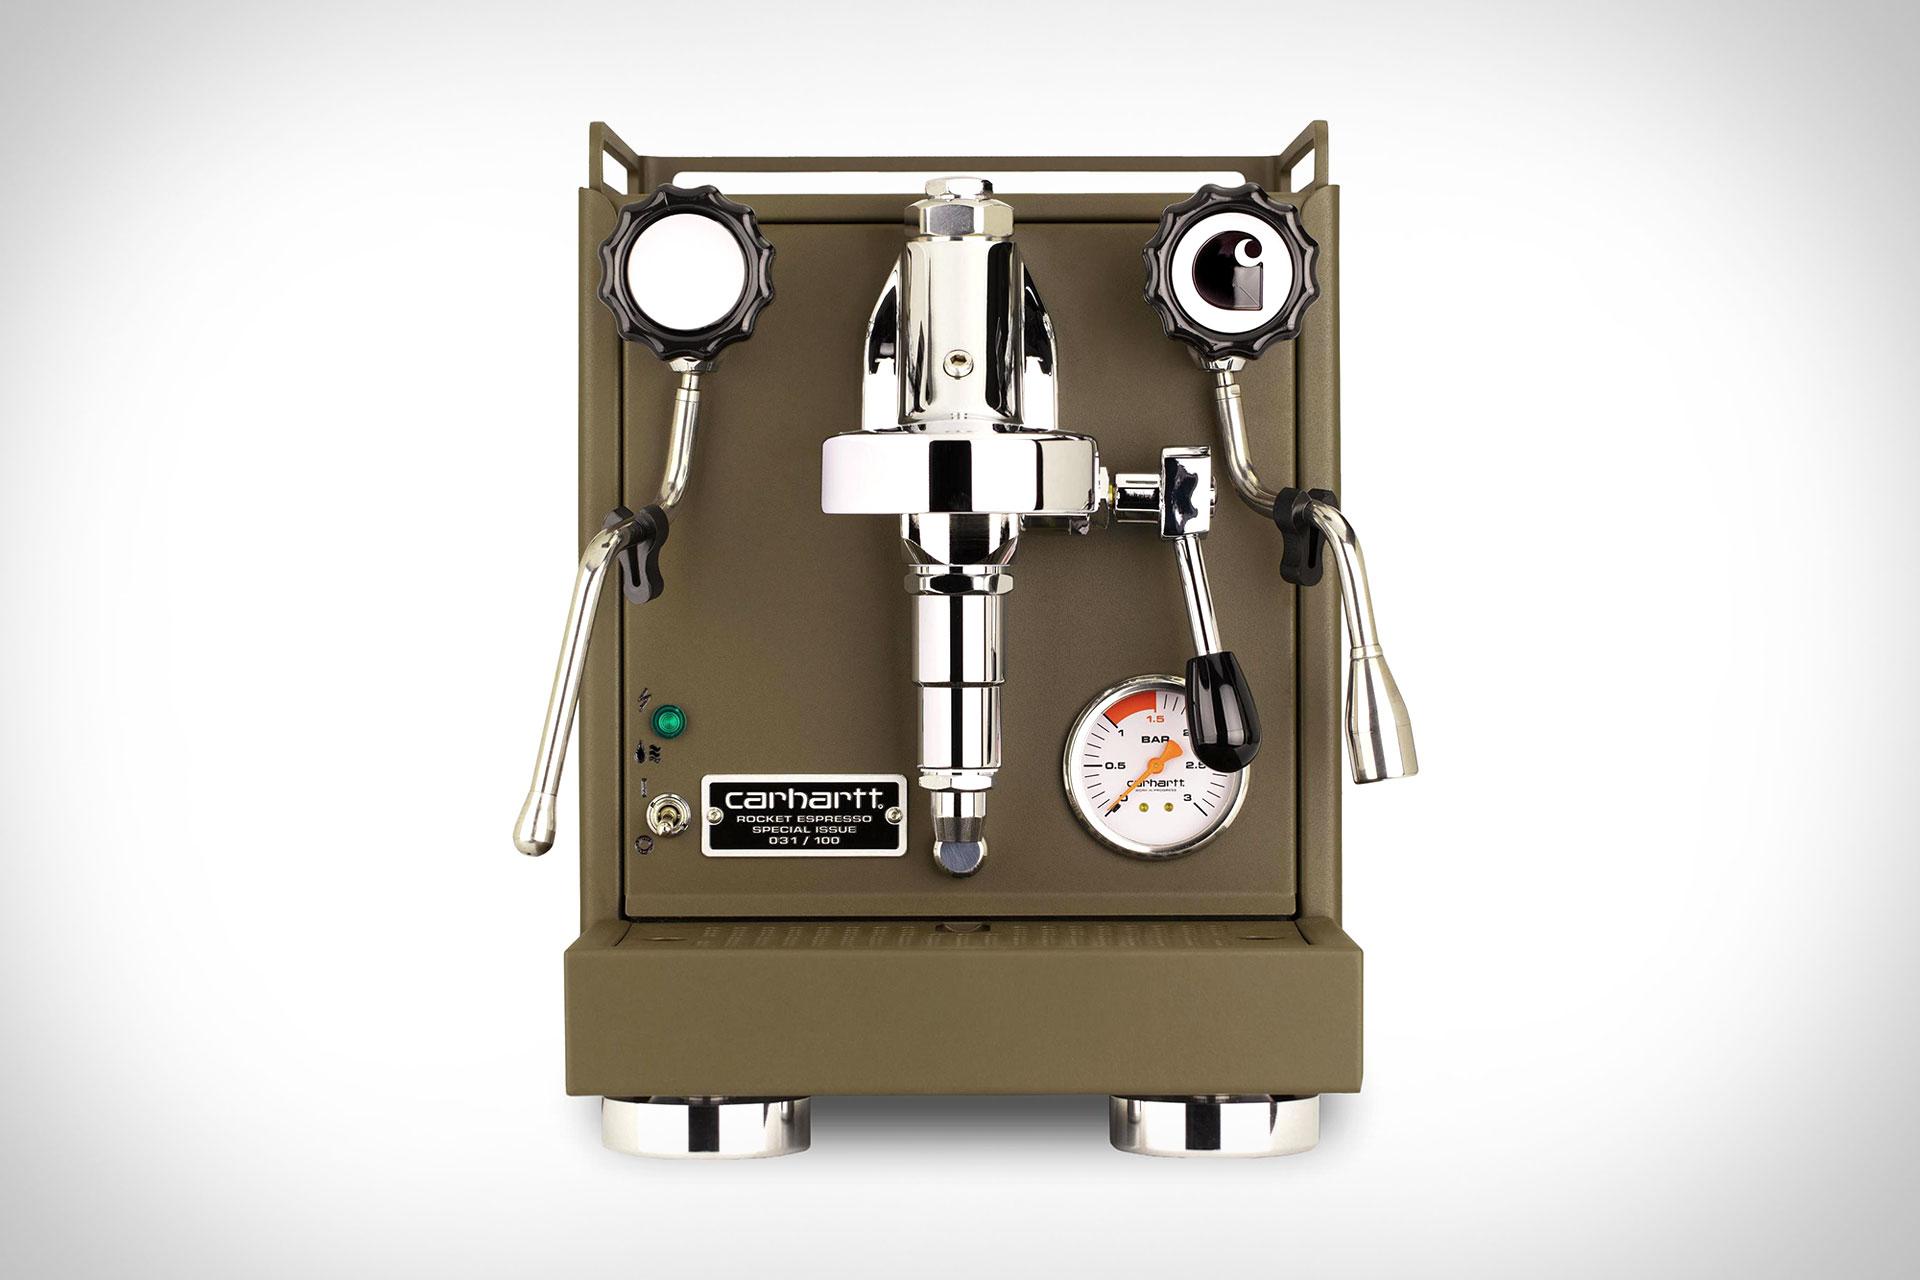 Rocket x Carhartt WIP Milano Espresso Machine